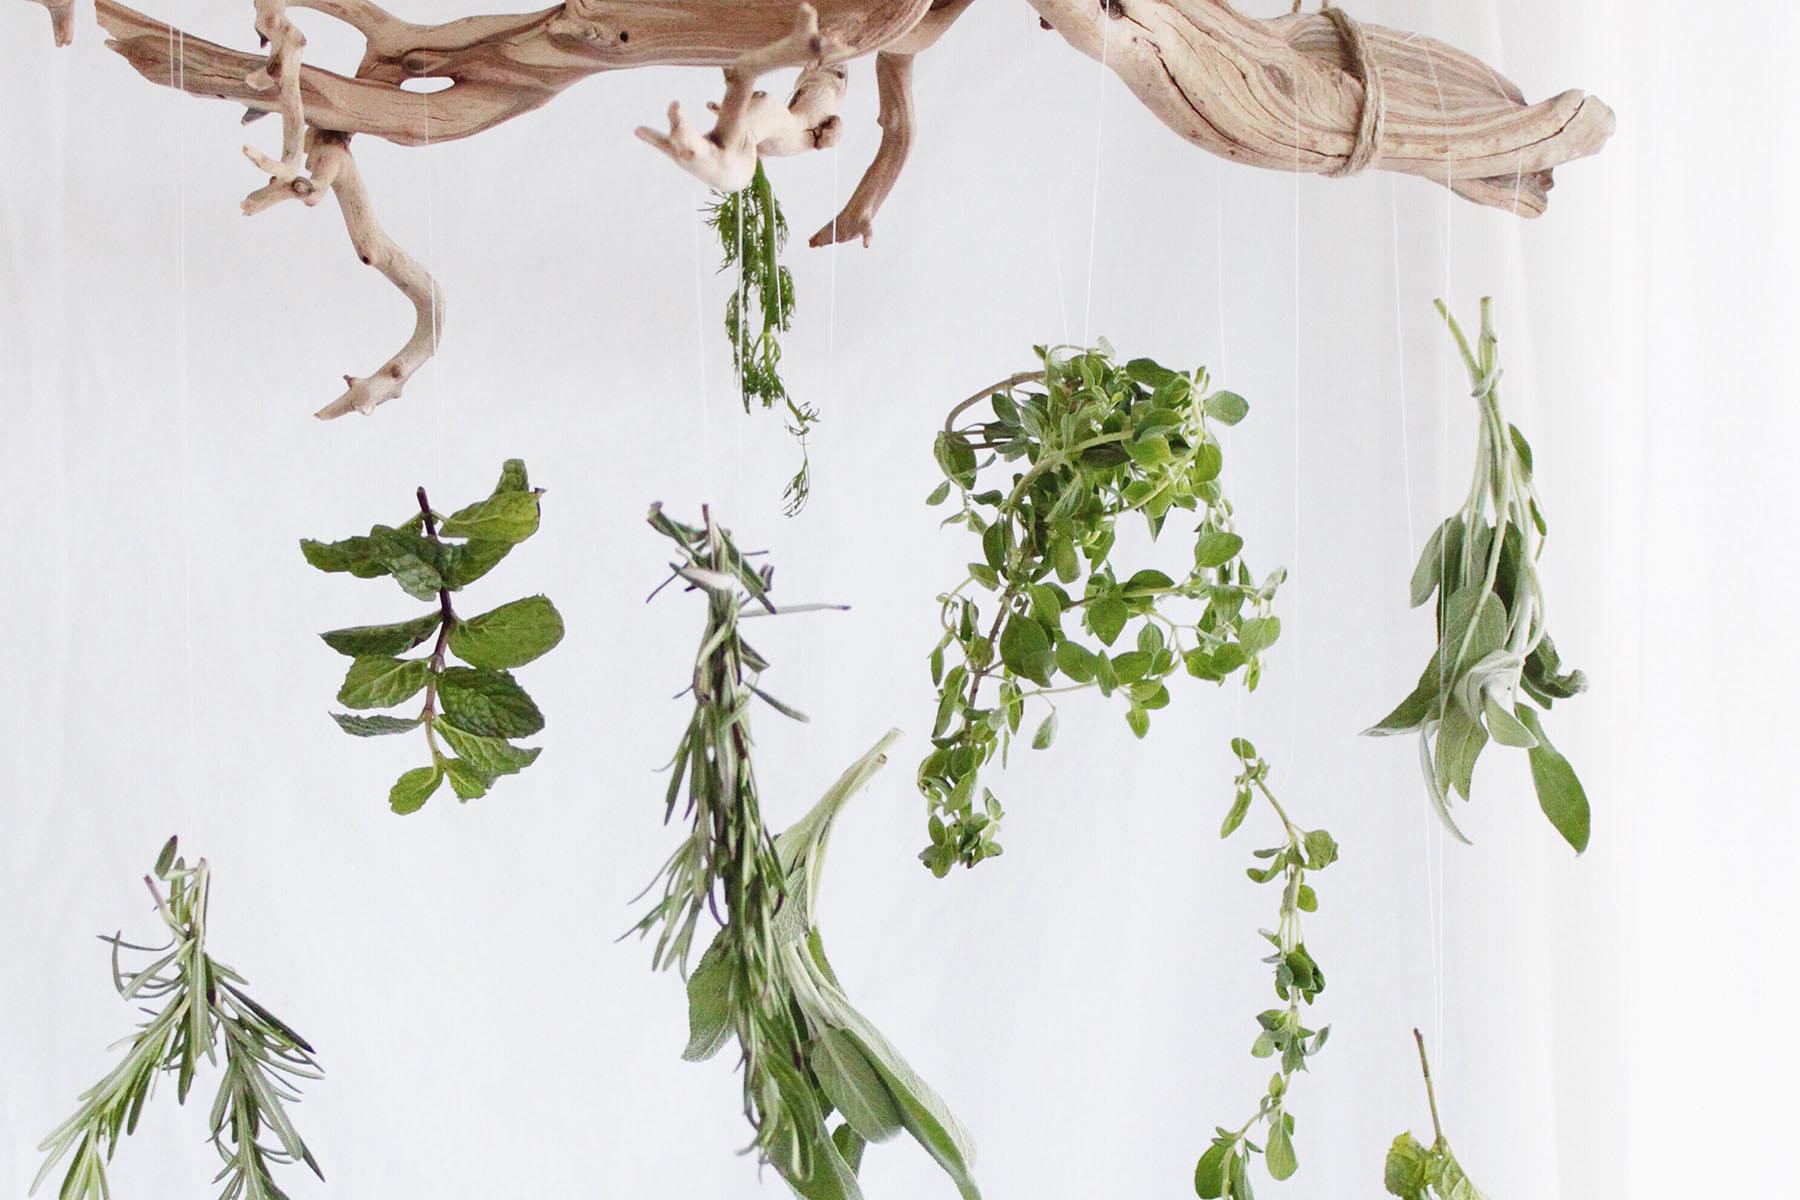 herbs dried